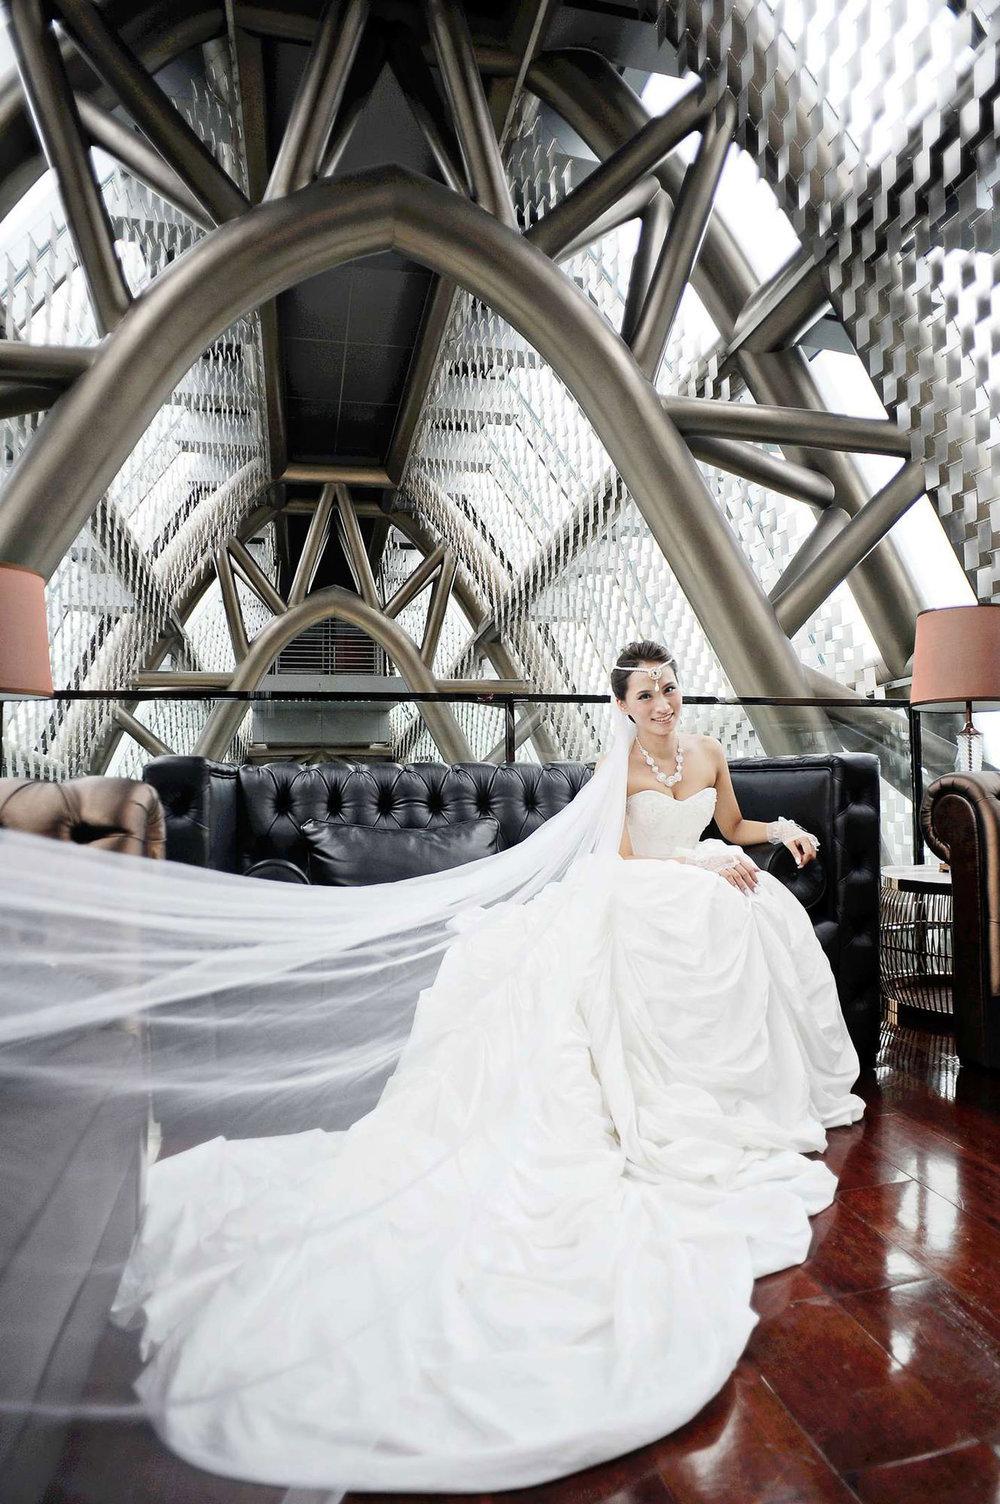 Chris_Hui_婚禮_婚紗照_pre_wedding_photography_best_058_.jpg